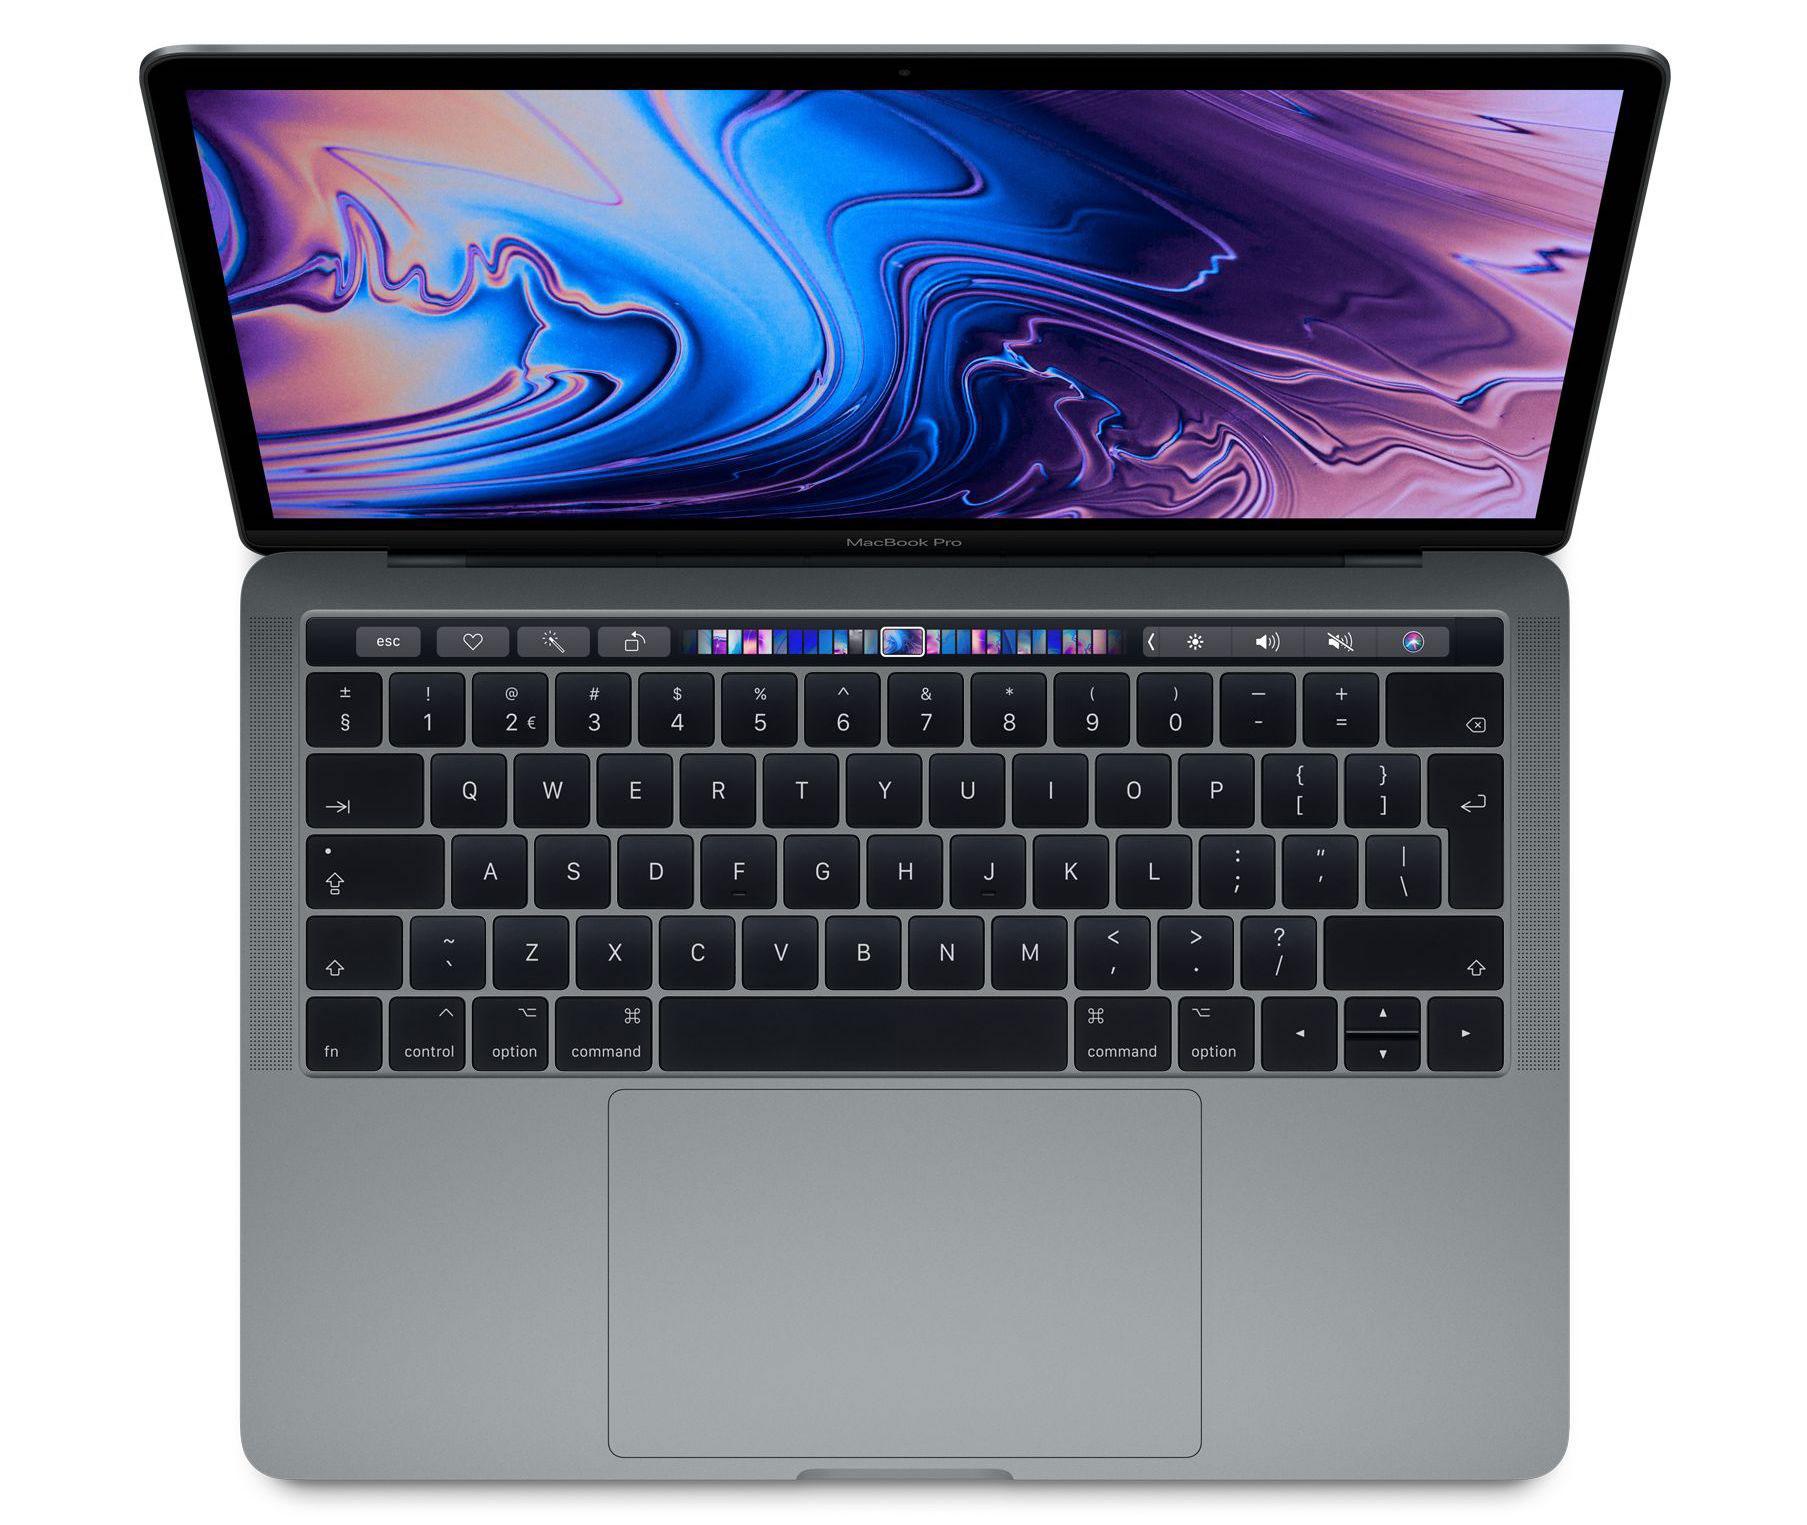 https://www.macfreak.nl/modules/news/images/zArt.13-inchMacBookPro2019.jpg